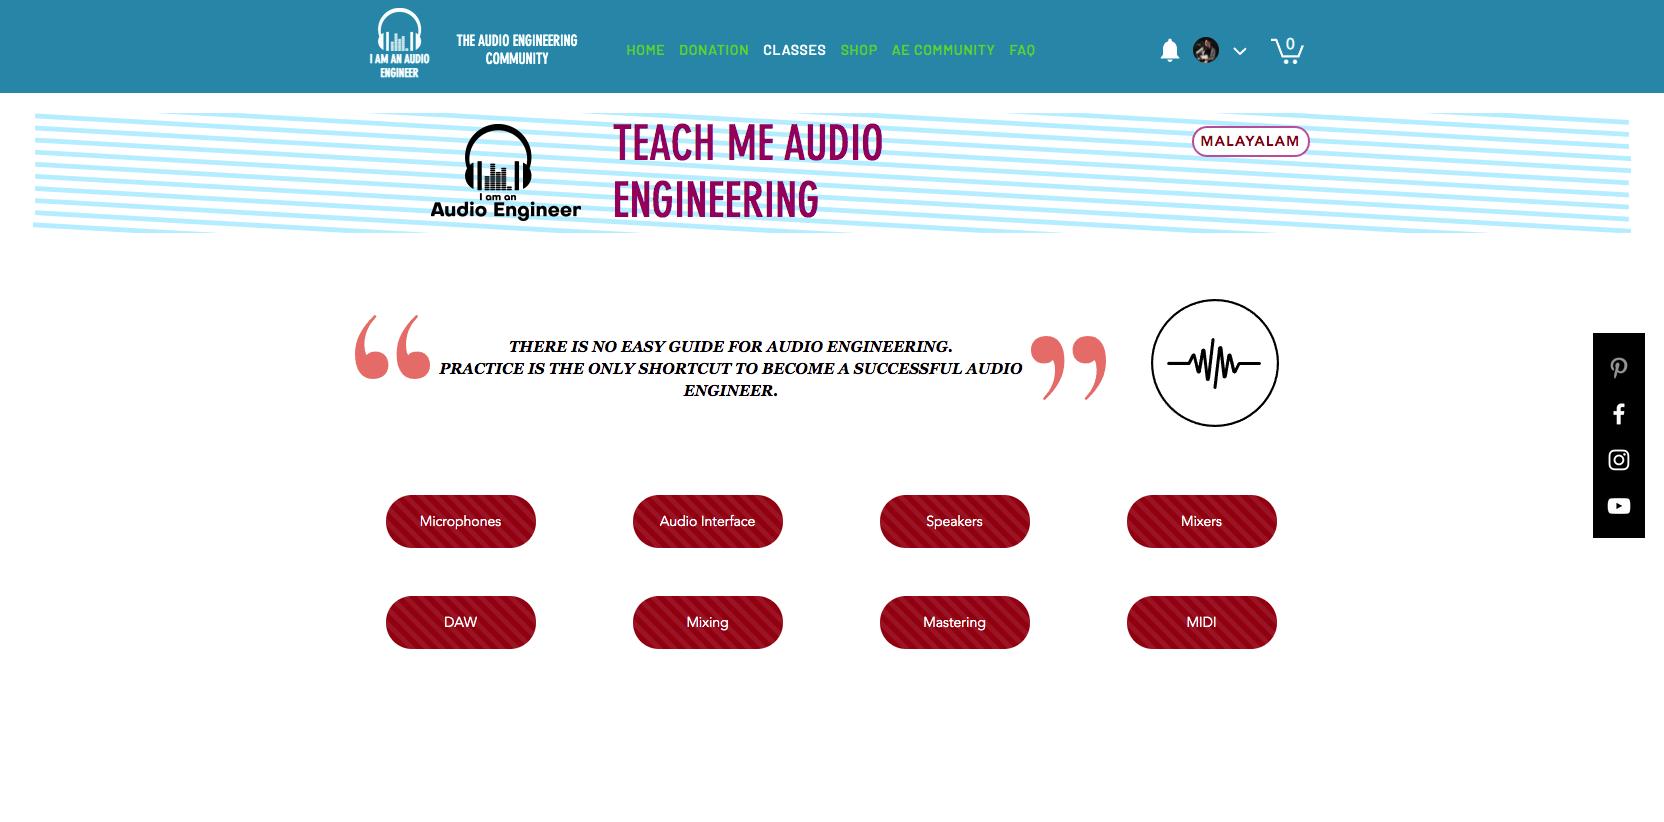 Audio engineering classes